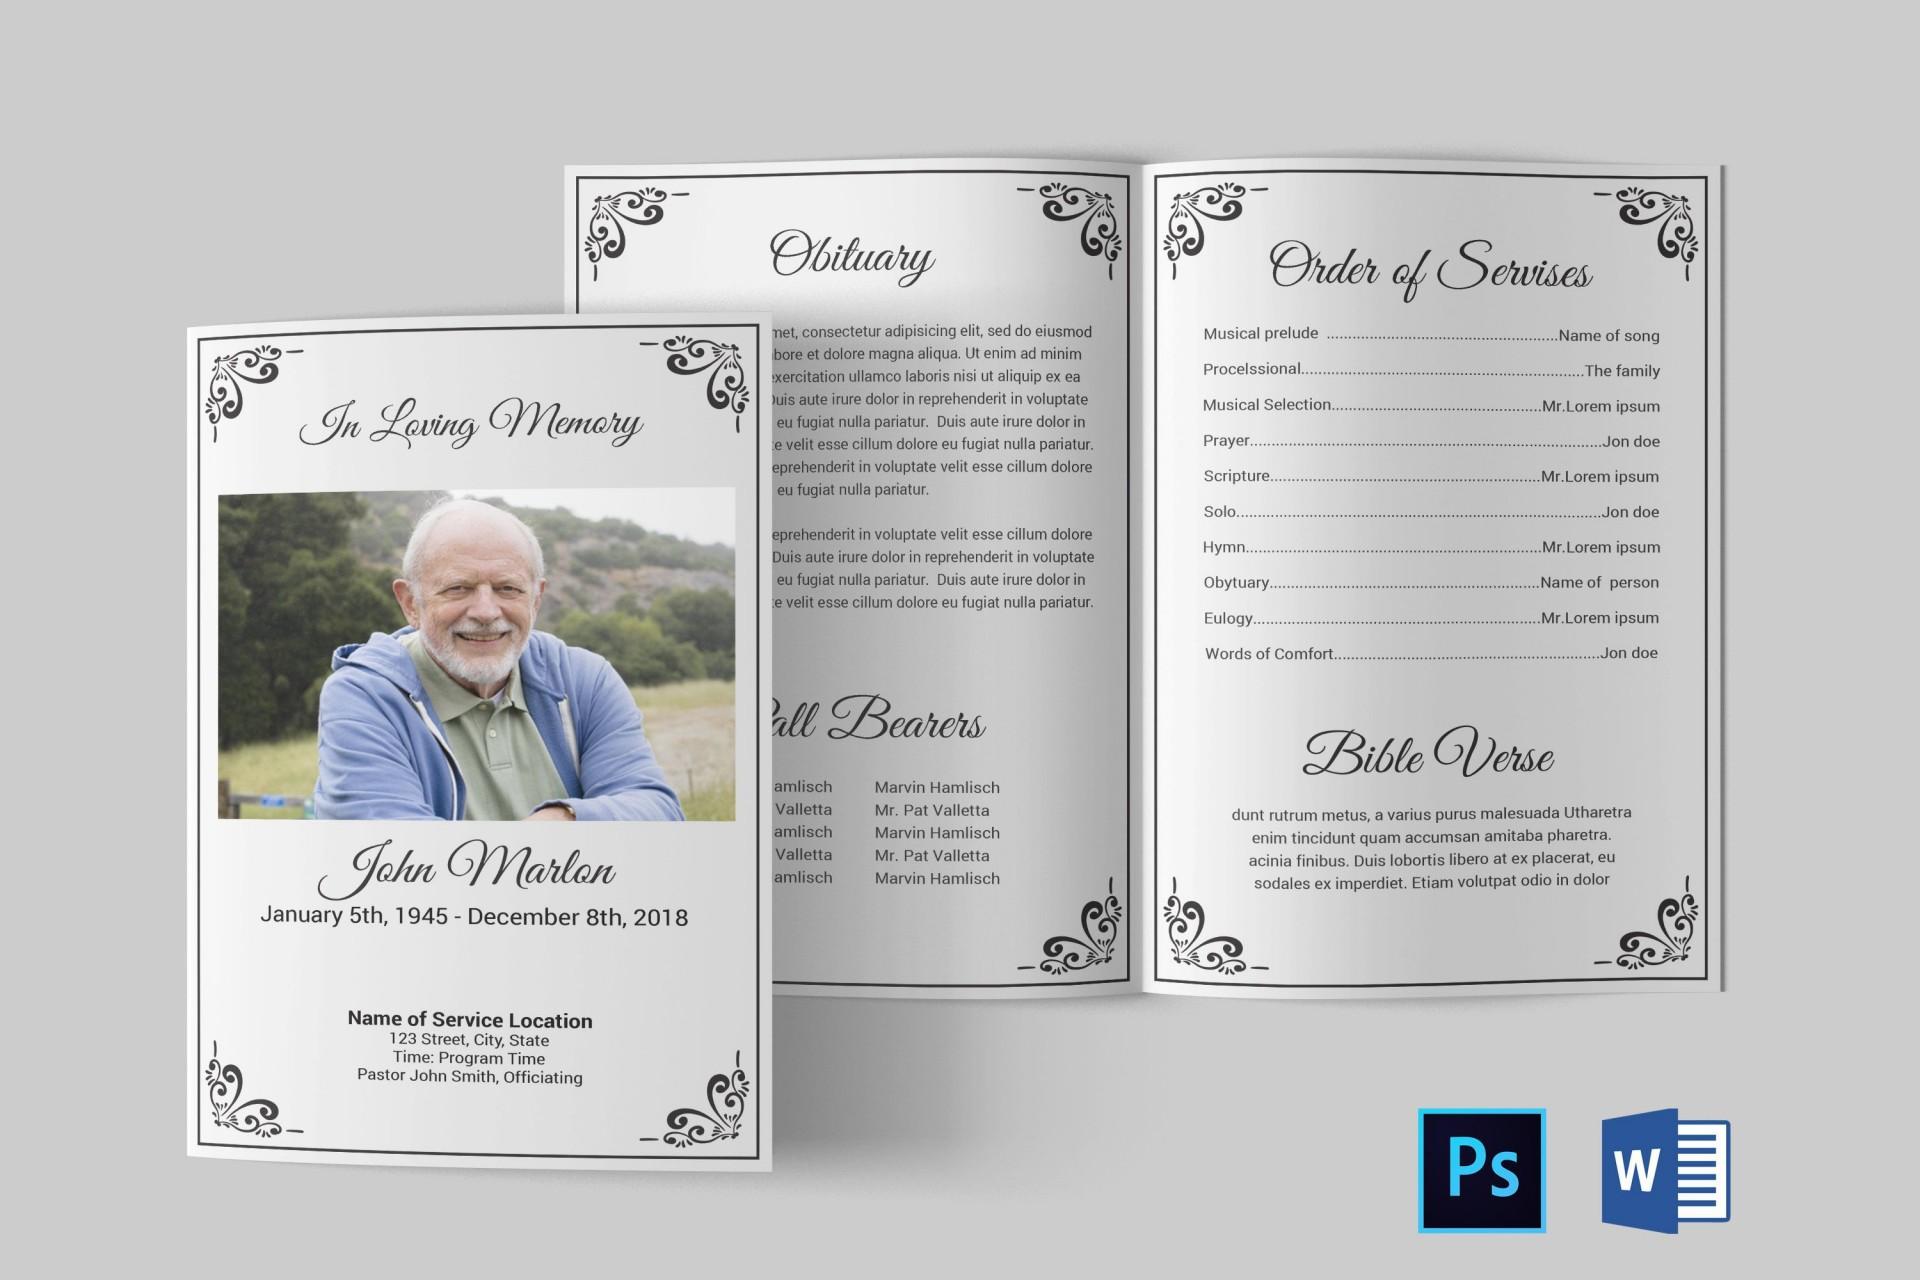 002 Impressive Free Funeral Program Template Inspiration  Word Catholic Editable Pdf1920